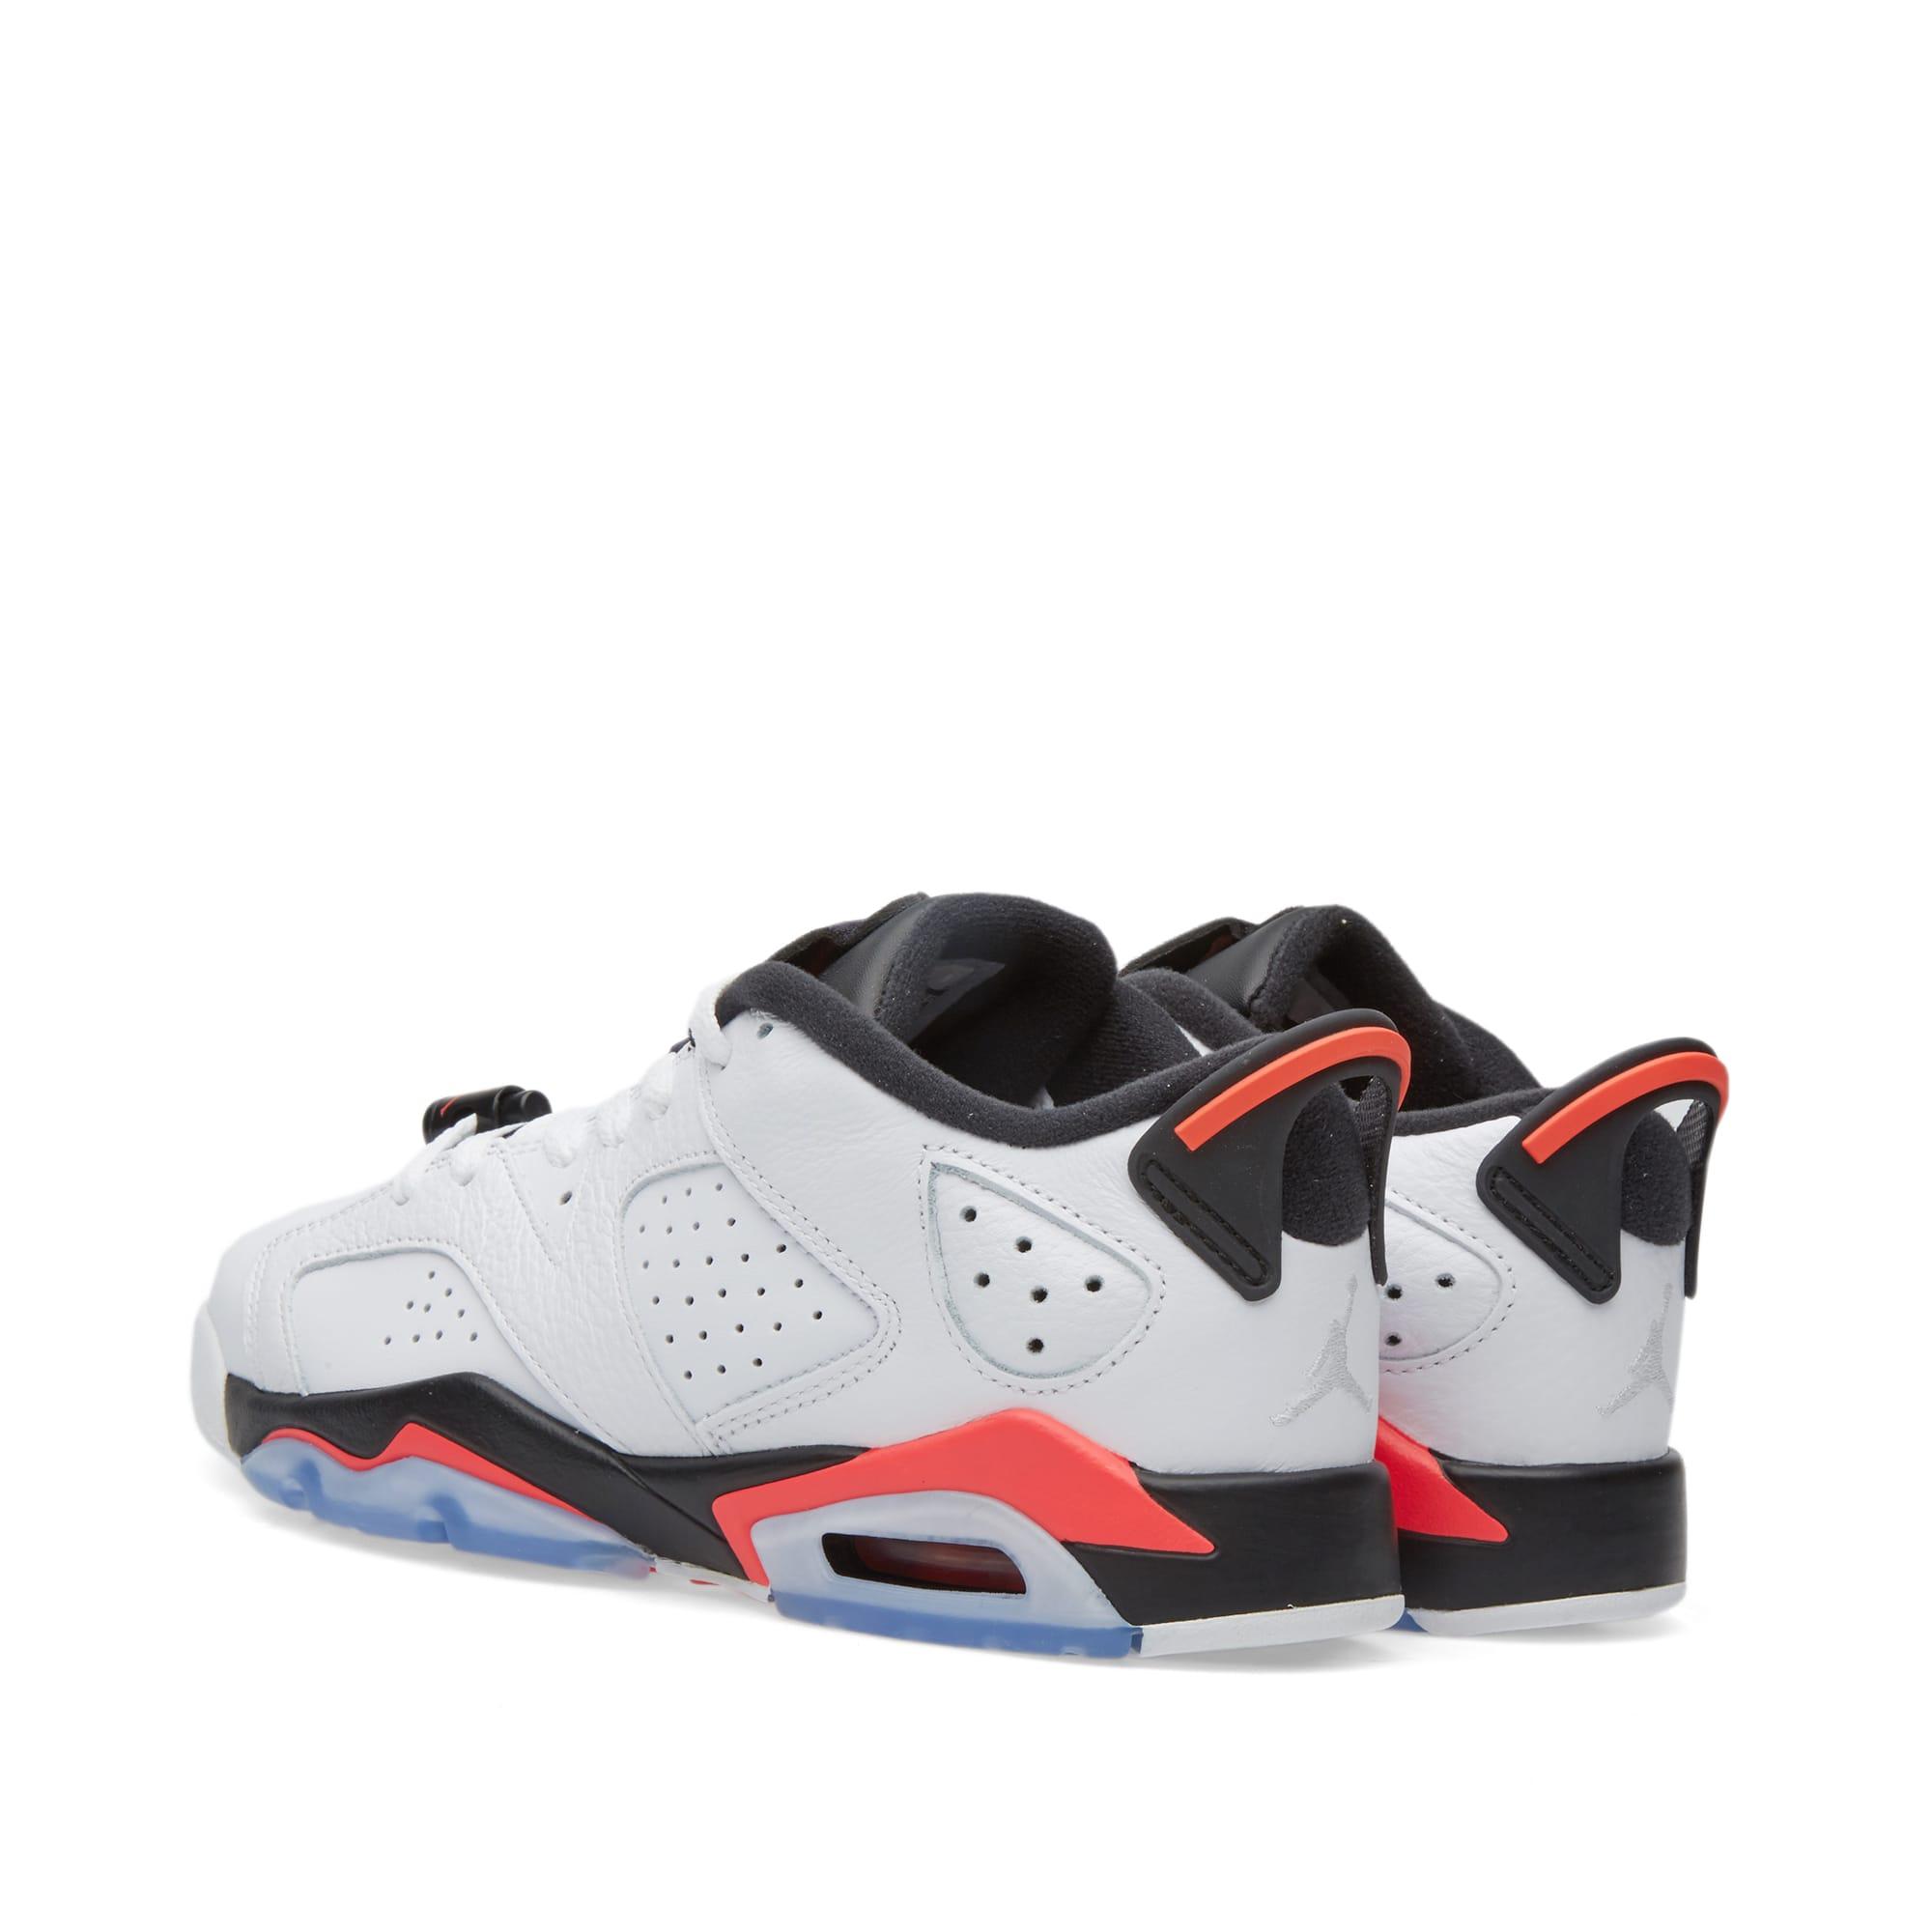 finest selection e364e e9bea Nike Air Jordan 6 Retro Low BG White, Infrared 23   Black   END.